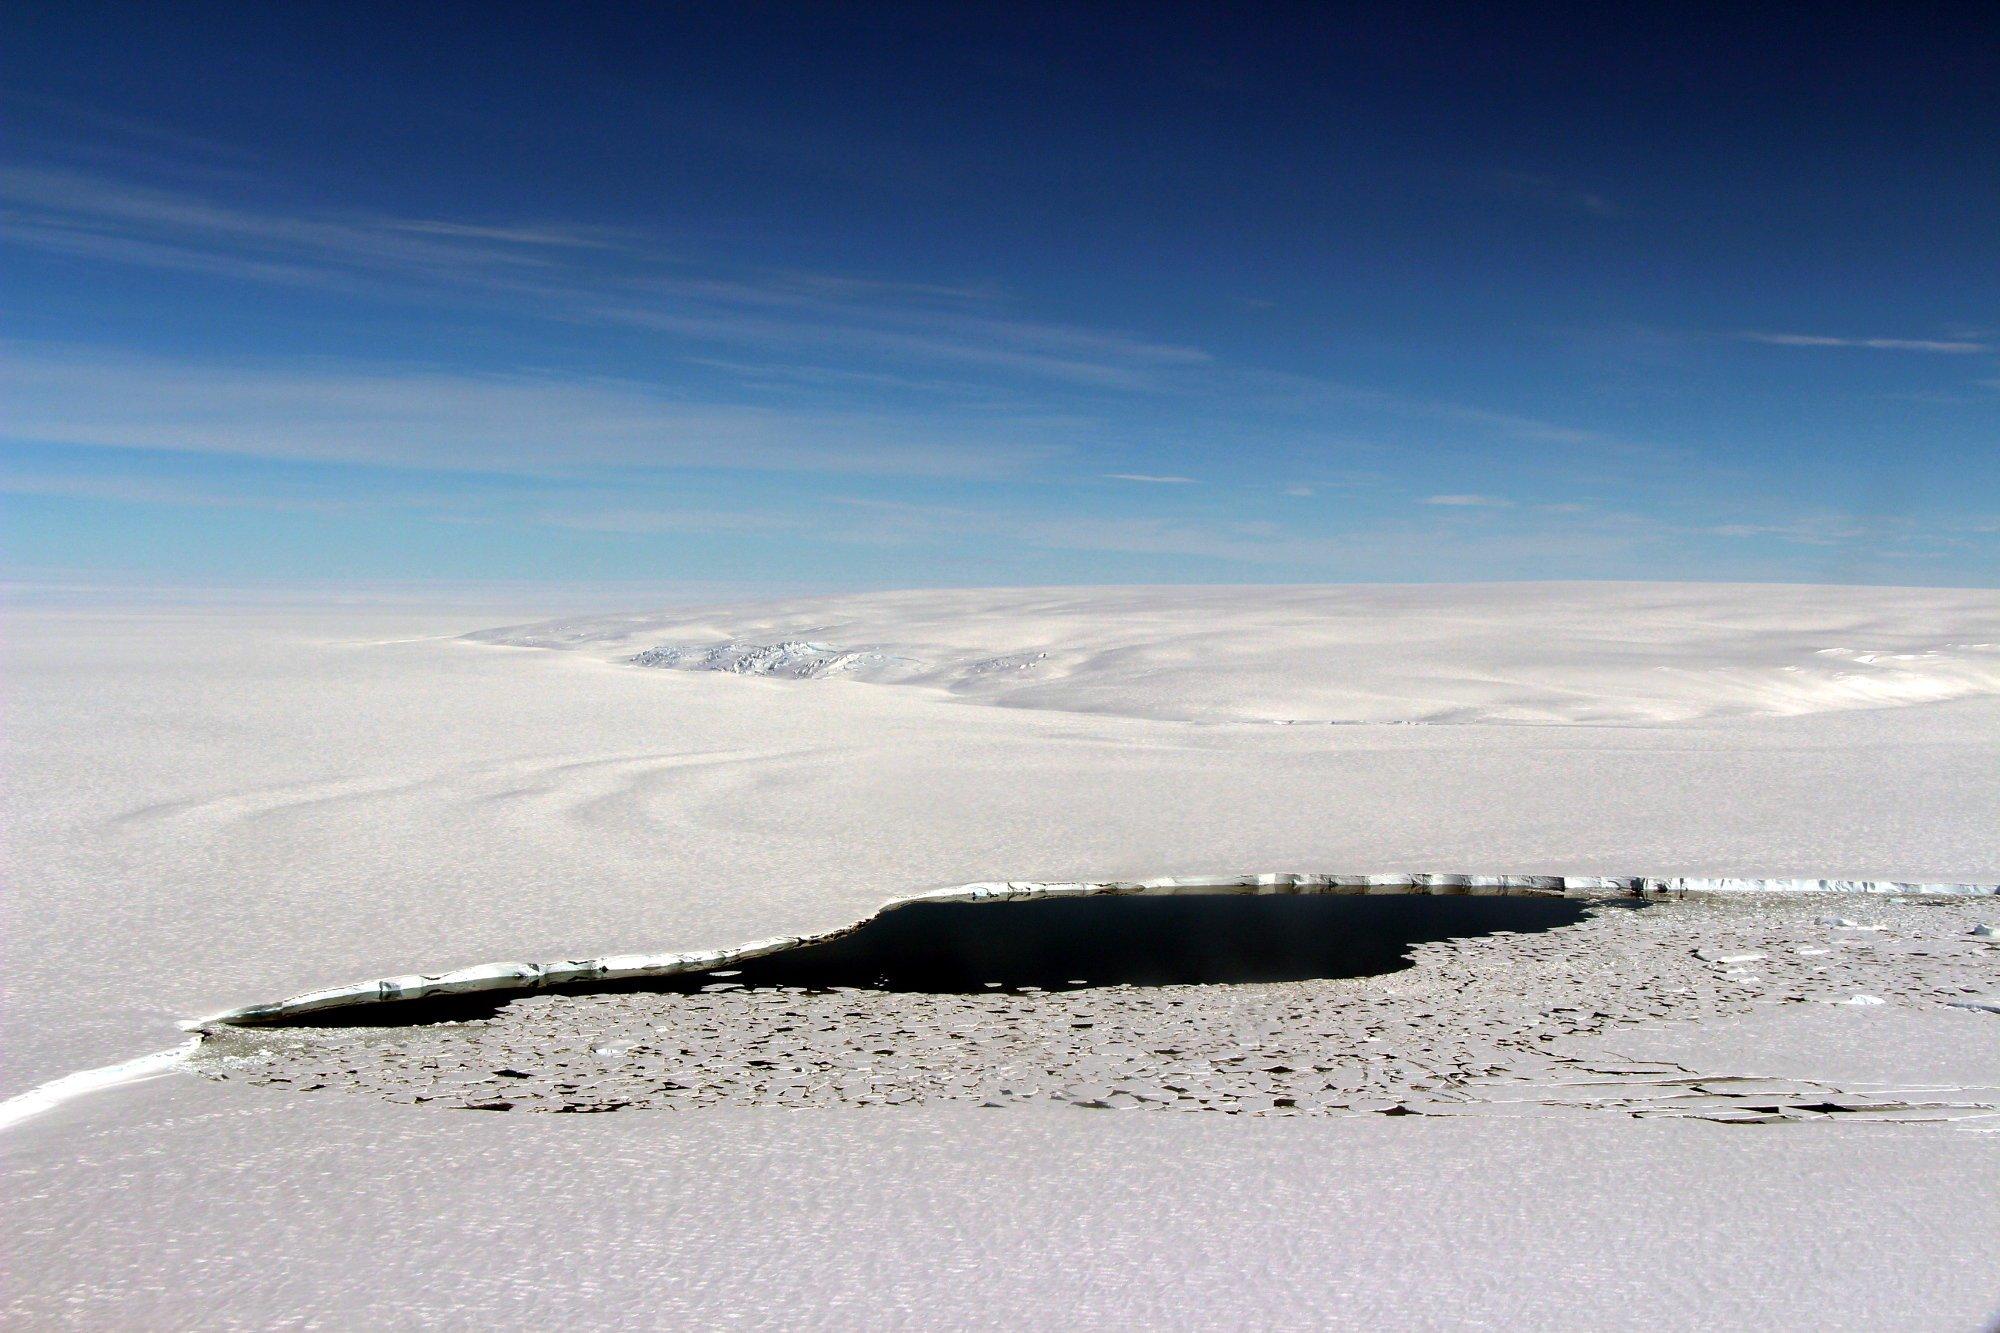 17cli-antarctica-superJumbo.jpg